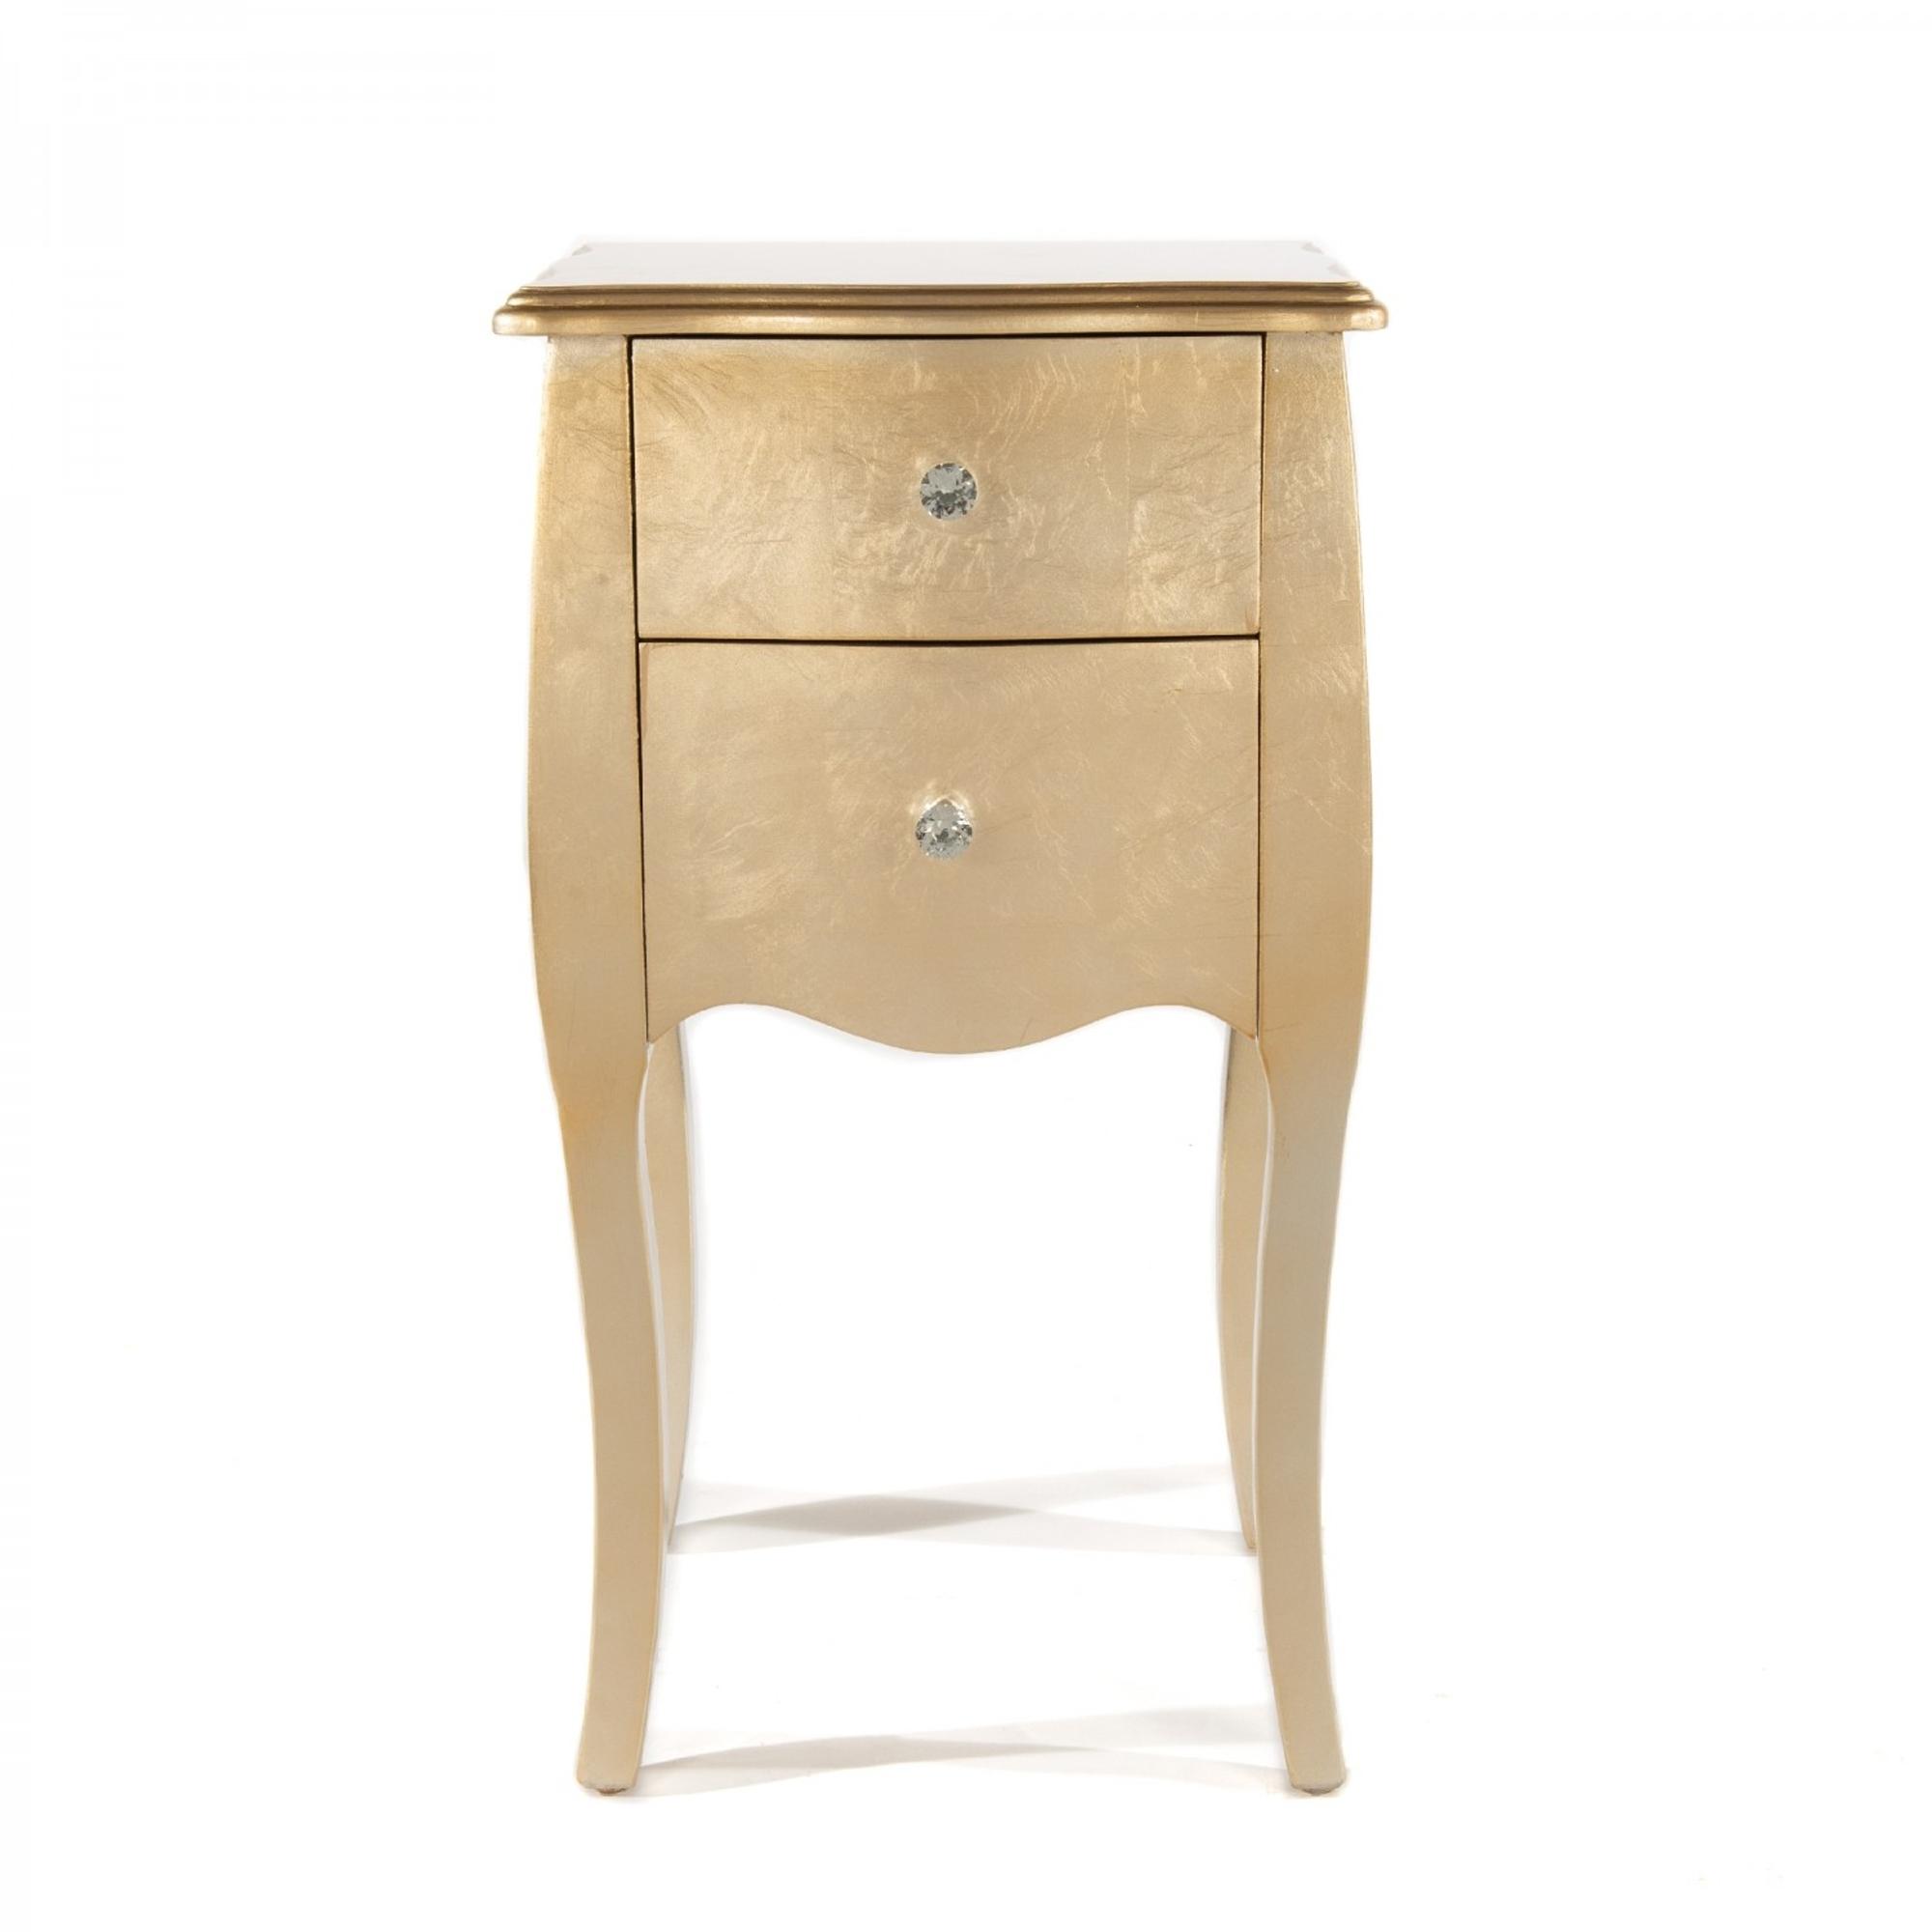 Gold Bedside Table 2 Drawer Gold Bedside Table Gold Table